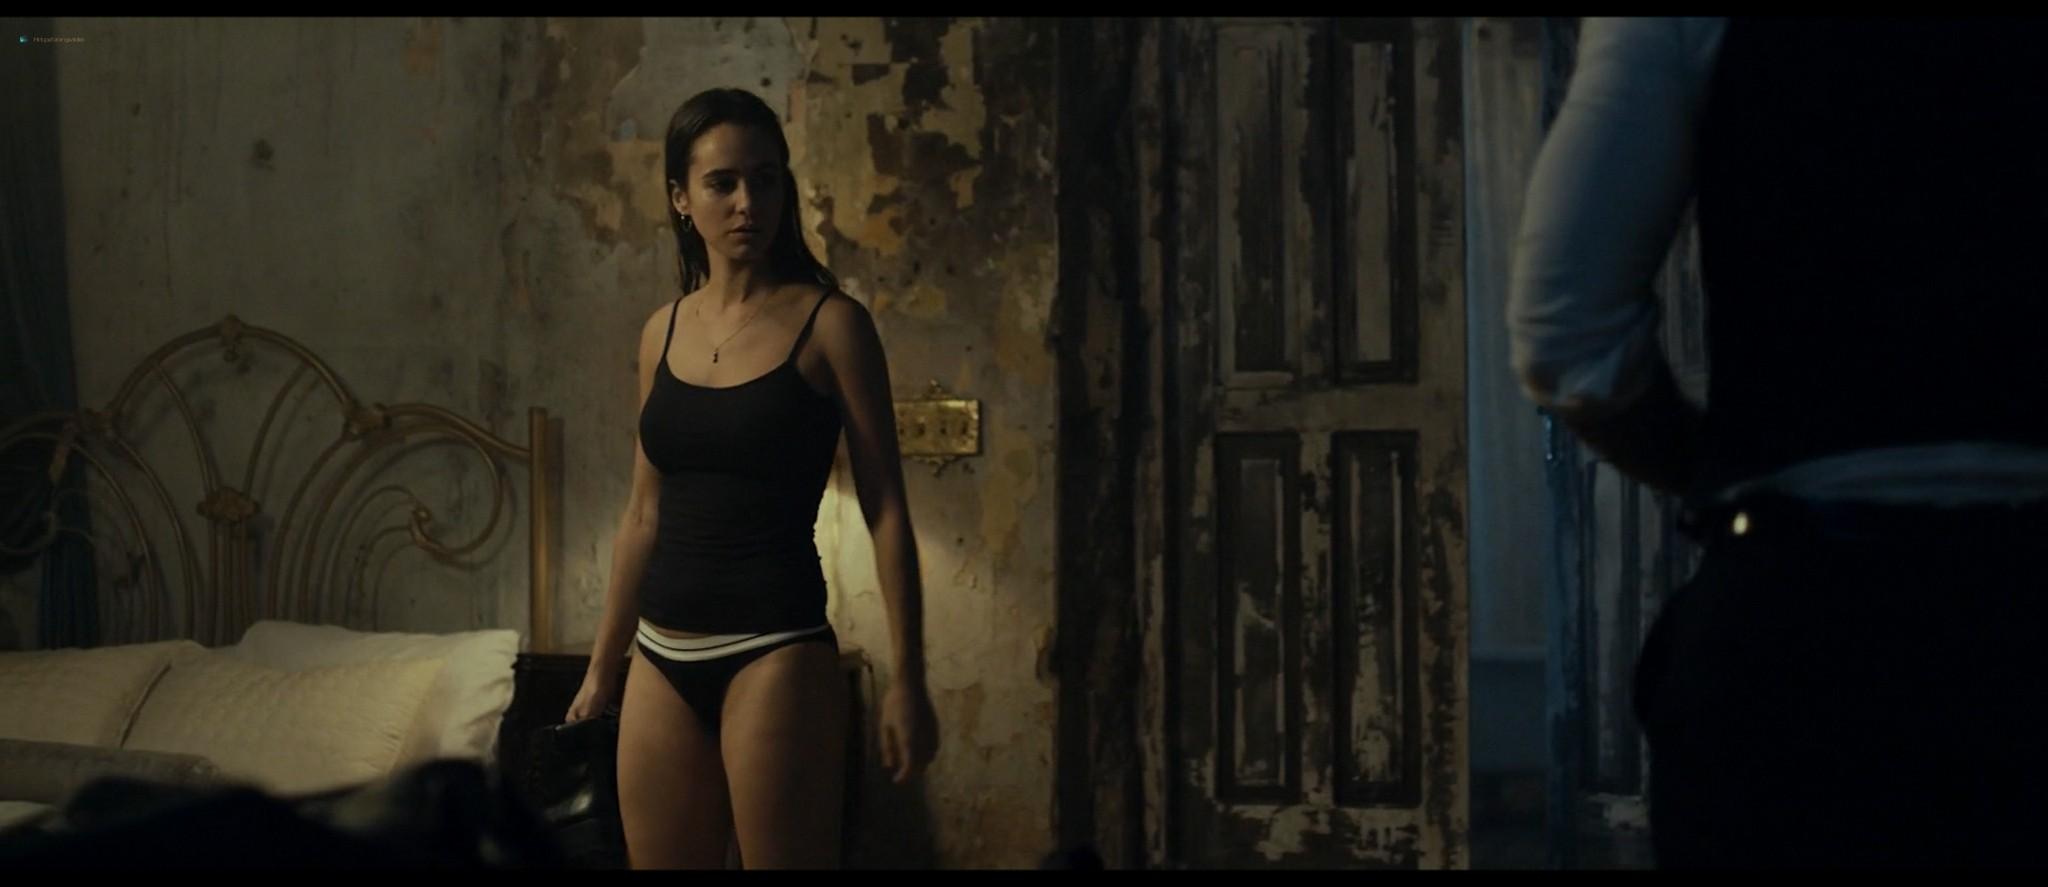 Alicia Sanz nude hot sex - En Brazos de un sesino (2019) HD 1080p Web (15)